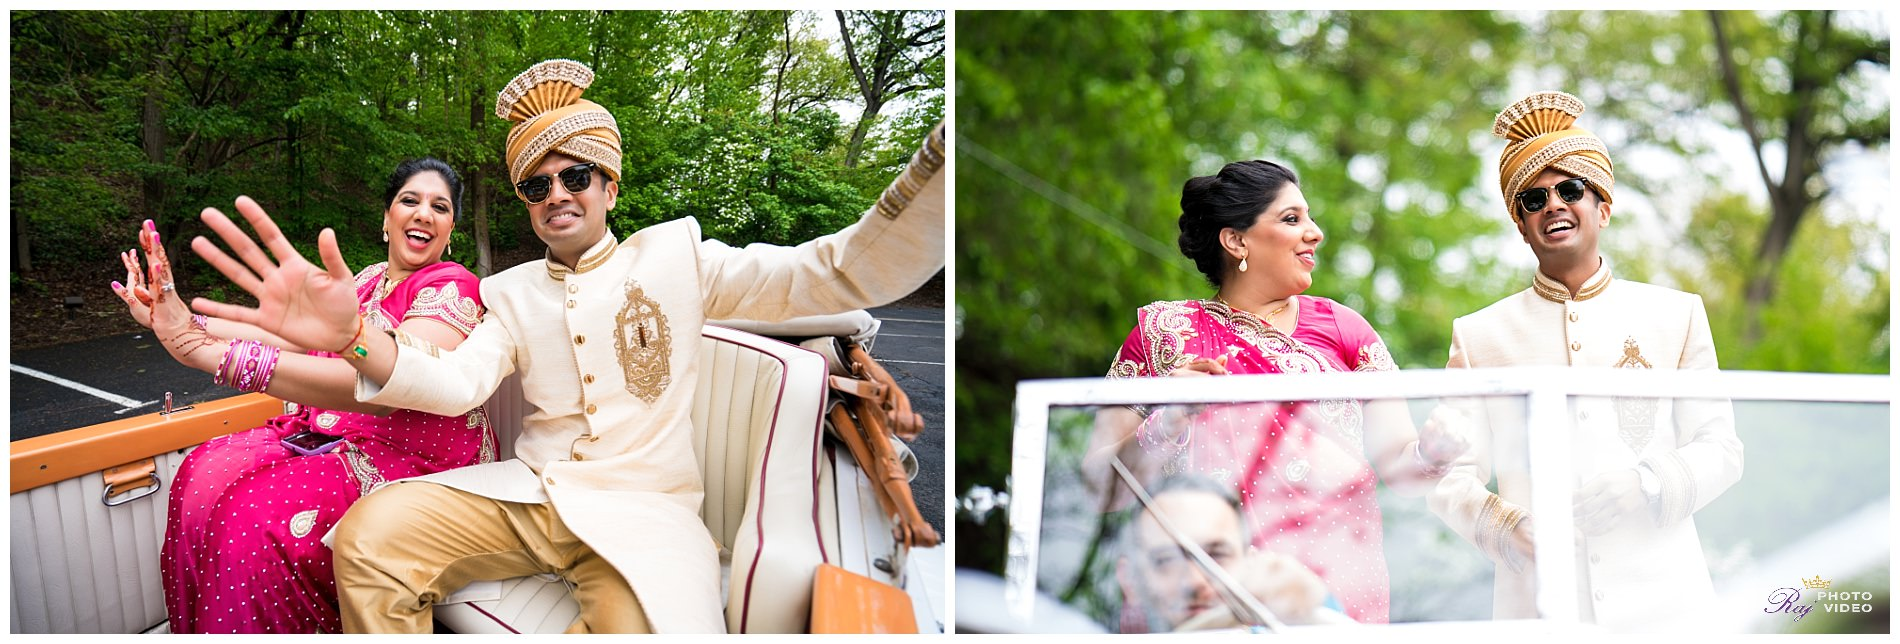 Martinsville-Gardens-NJ-Indian-Wedding-Ruchi-Vishal-20.jpg